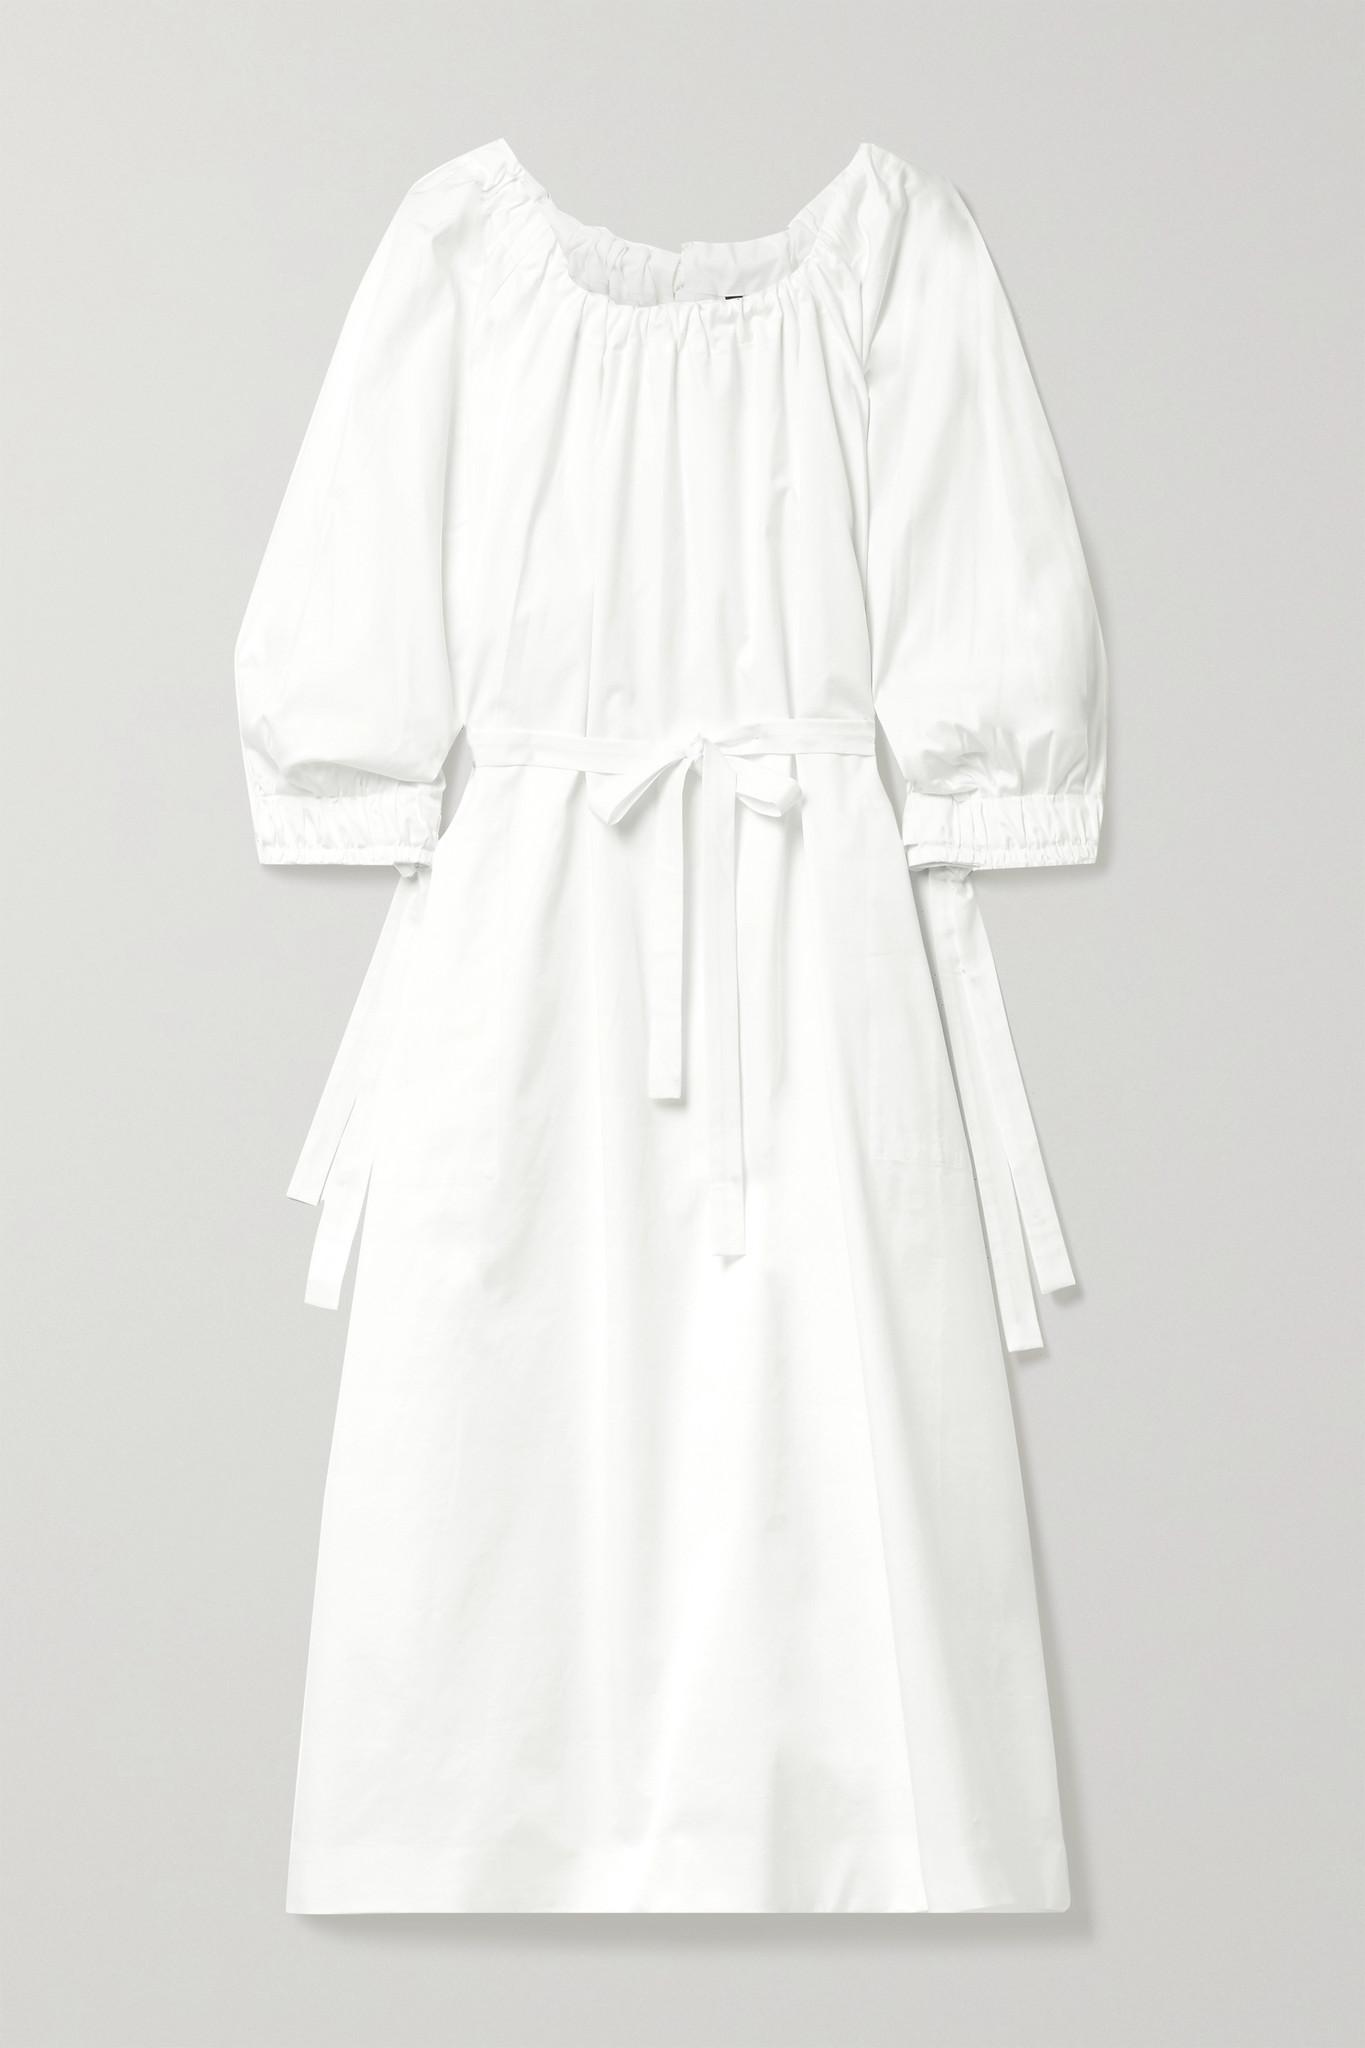 MOTHER OF PEARL - Zariah 配腰带褶饰棉质混纺府绸中长连衣裙 - 白色 - small